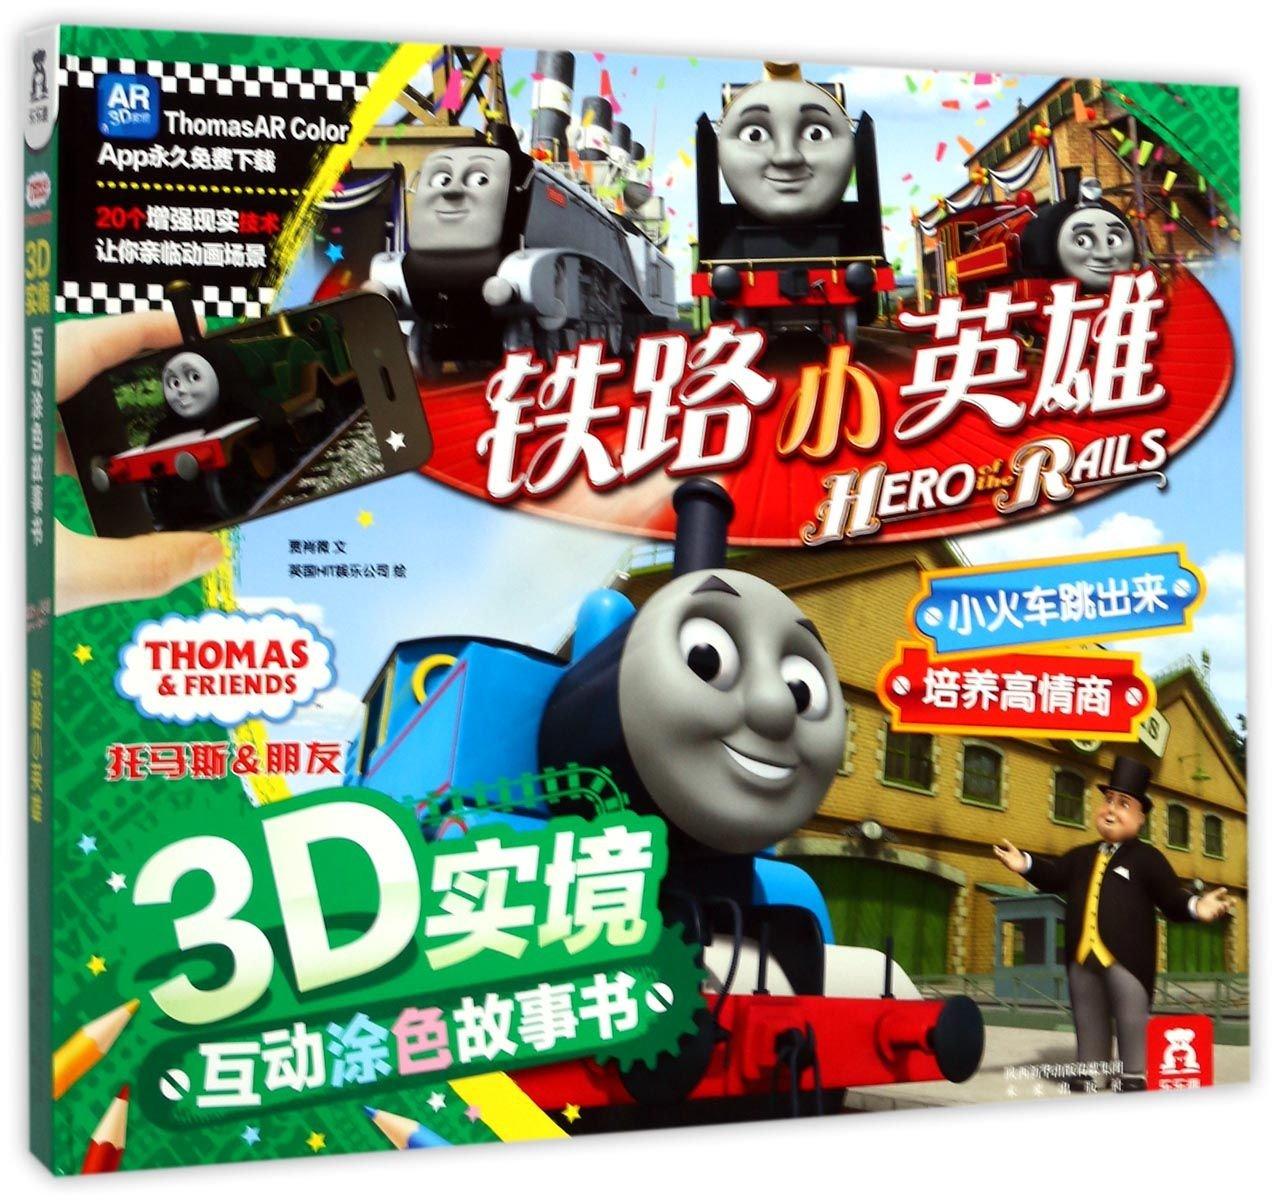 Download 铁路小英雄(精)/托马斯&朋友3D实境互动涂色故事书 pdf epub